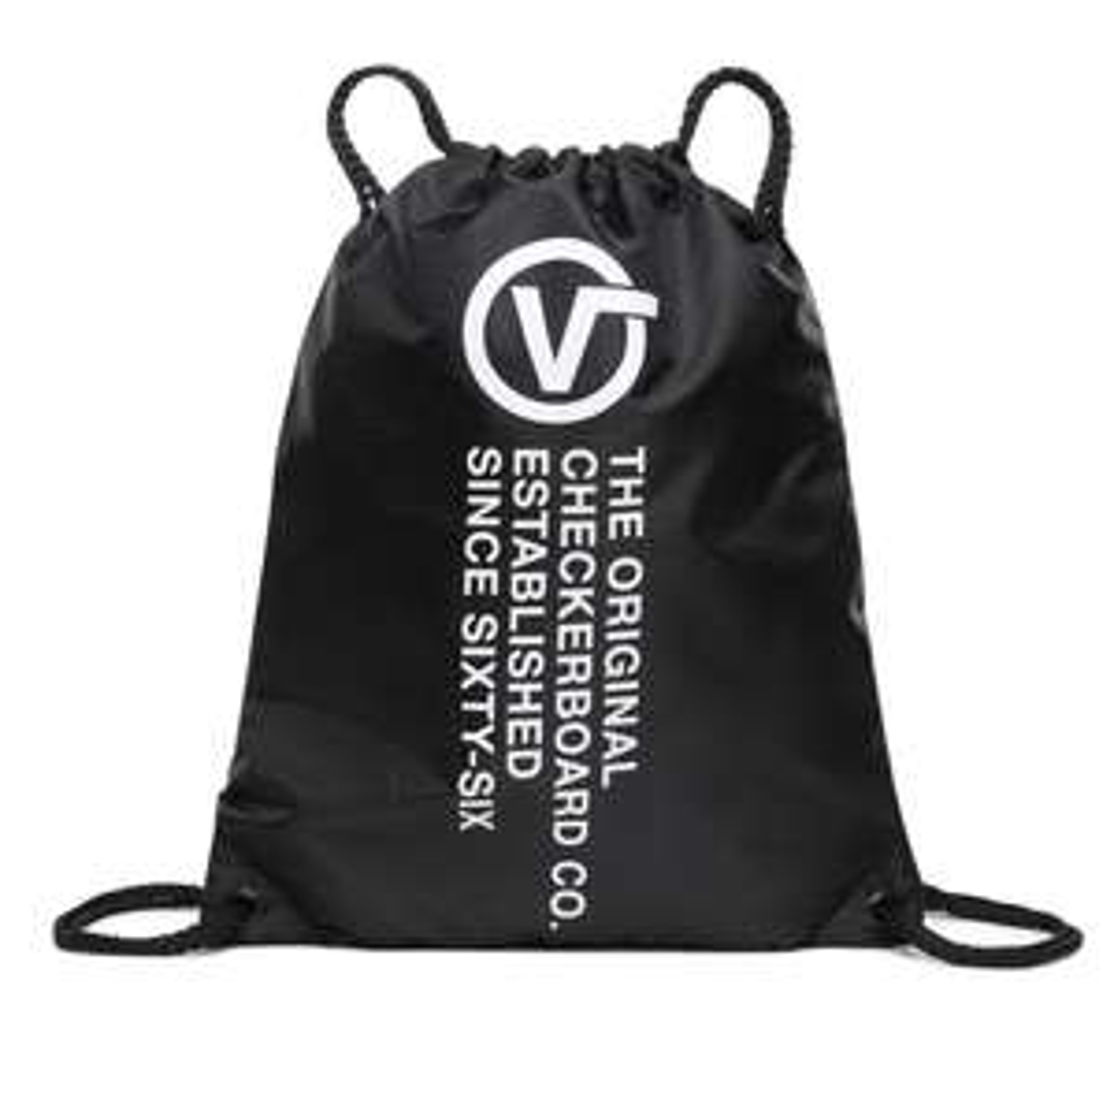 Half Price Vans Gym Bag - Extra 10% Off With Code, Free Delivery & Returns @ Vans